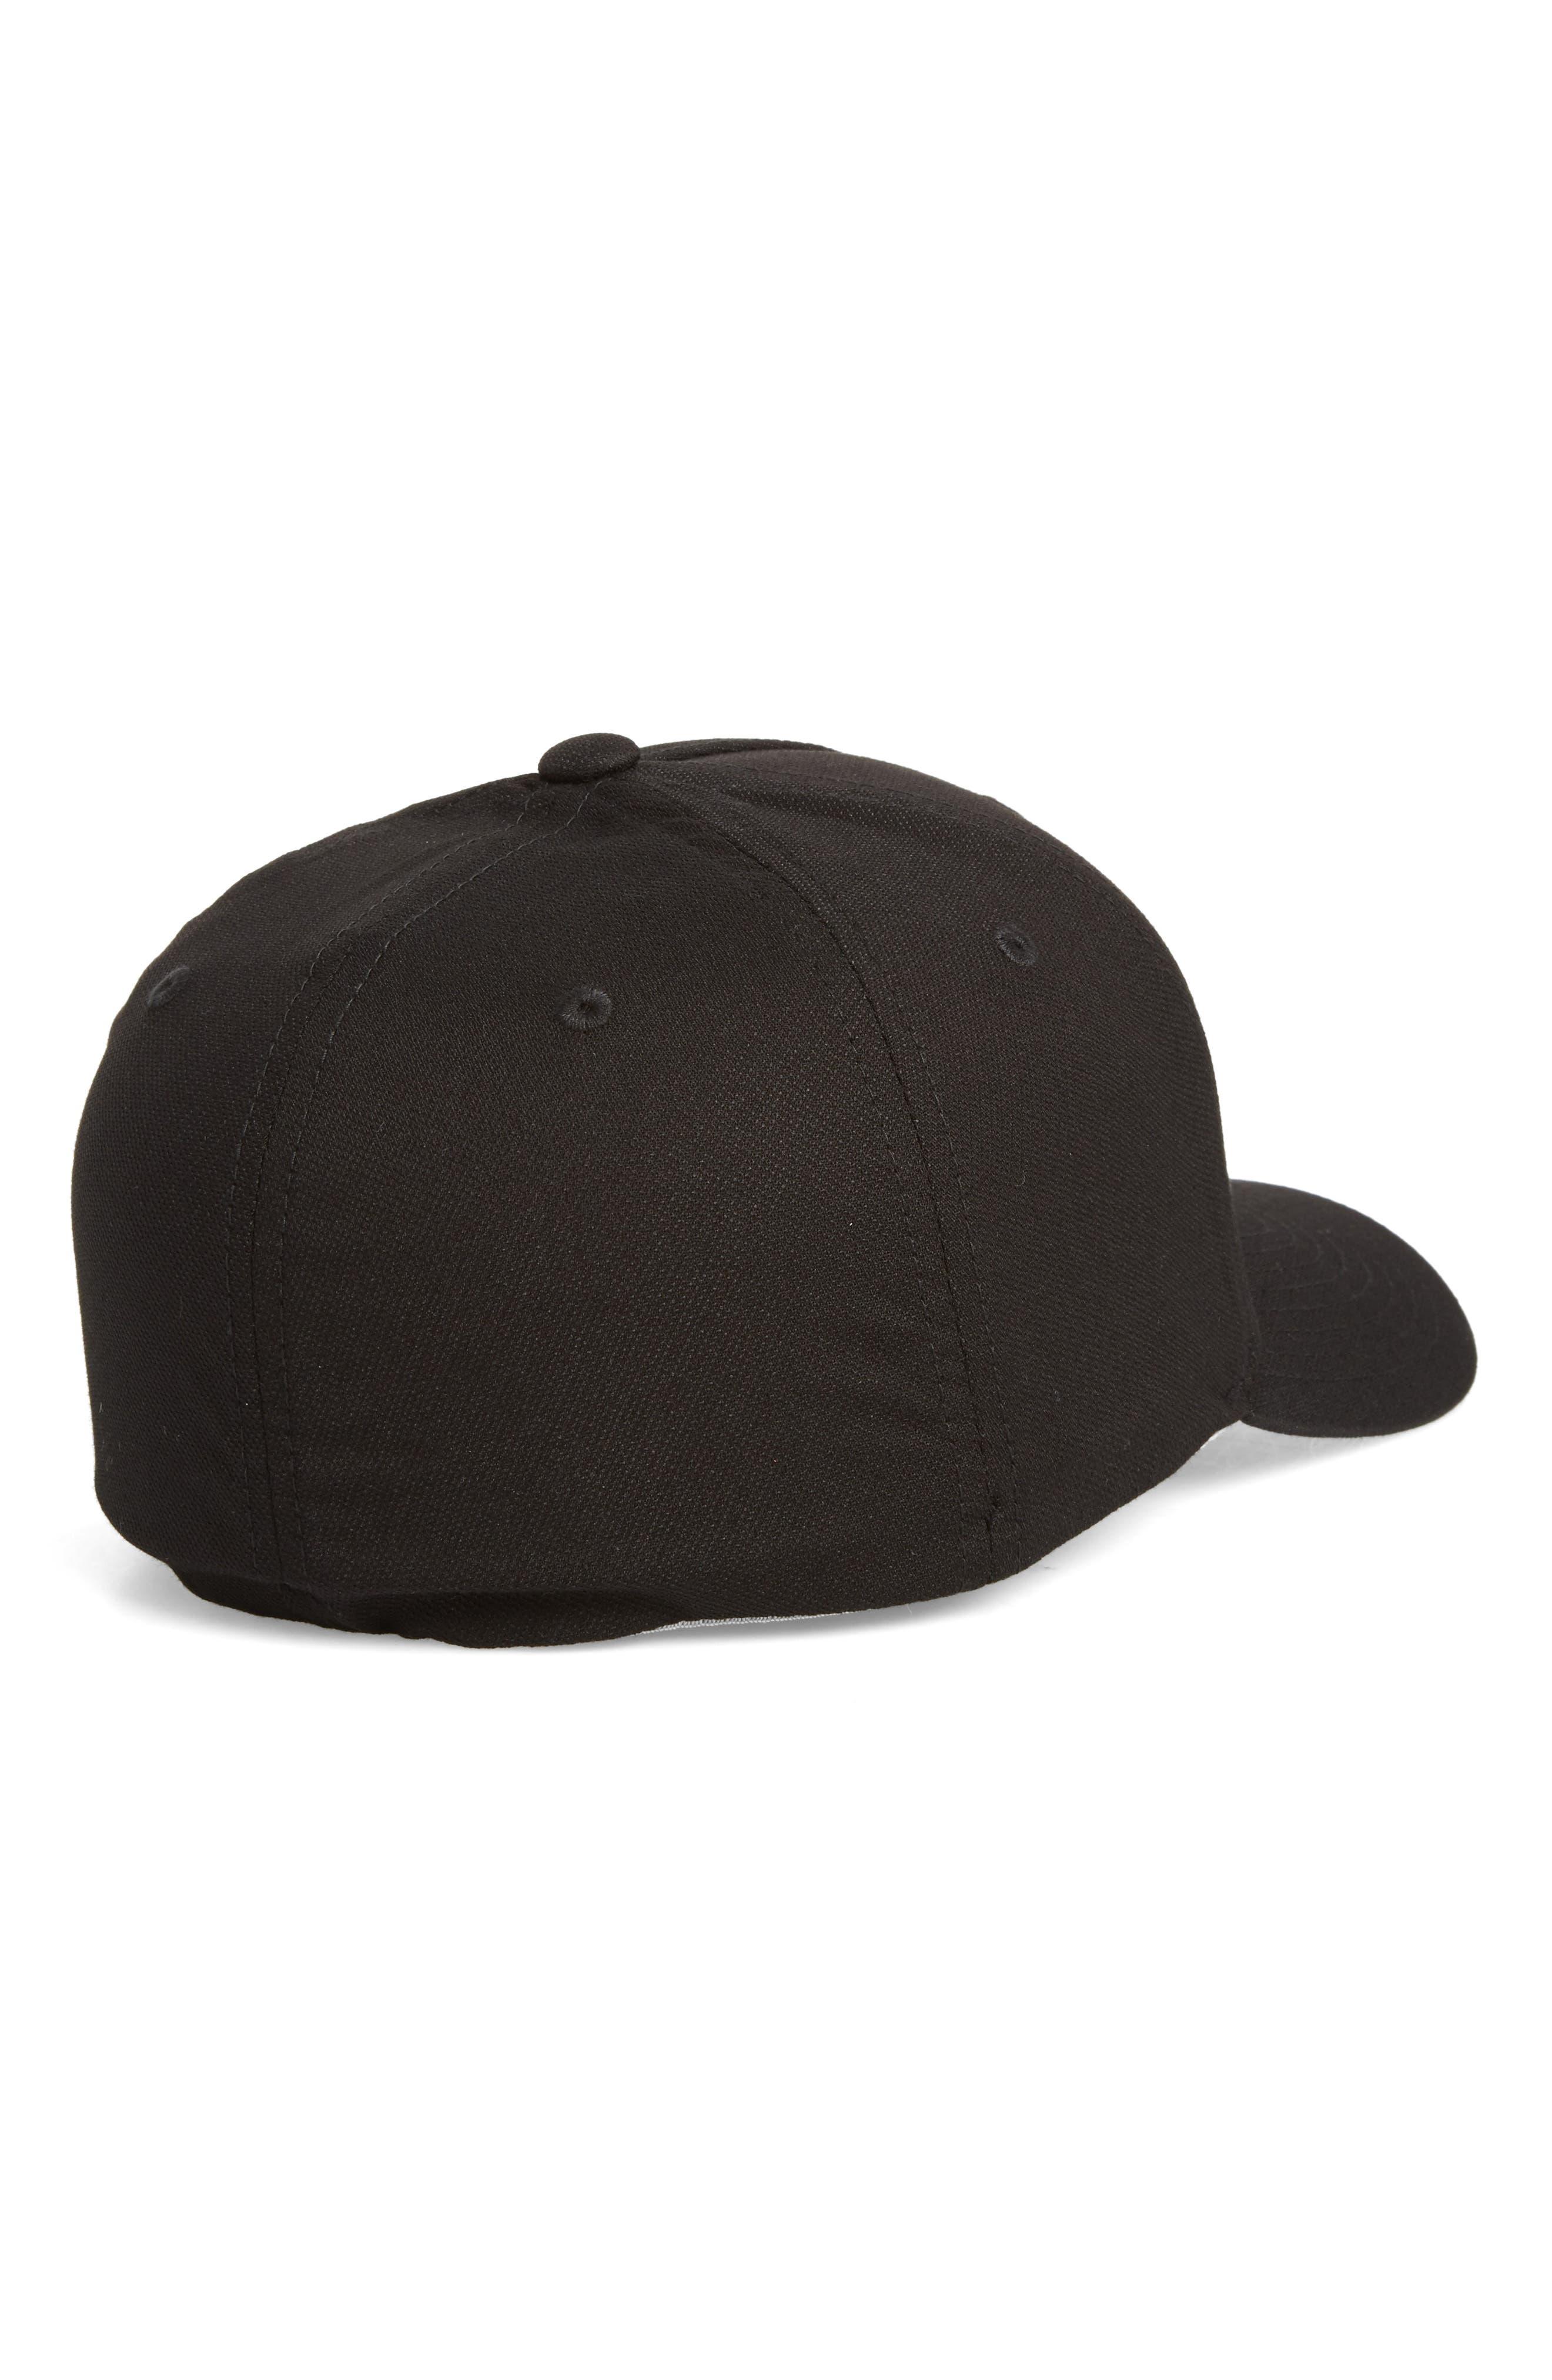 Van Dyke Flex Fit Baseball Cap,                             Alternate thumbnail 2, color,                             001